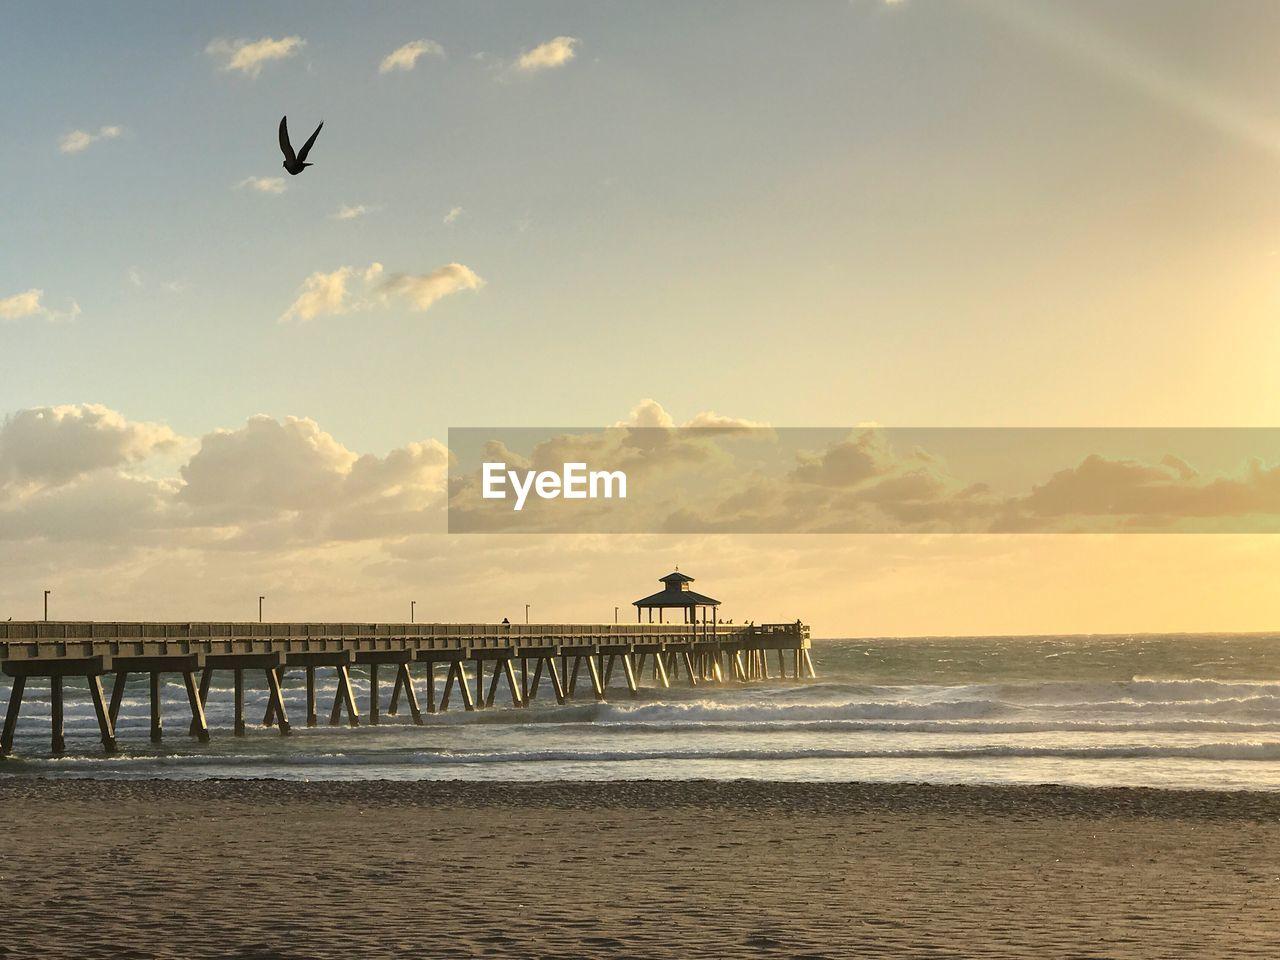 water, sky, sea, scenics - nature, sunset, horizon over water, horizon, bird, beauty in nature, animal themes, beach, vertebrate, cloud - sky, animal, land, tranquil scene, nature, built structure, architecture, outdoors